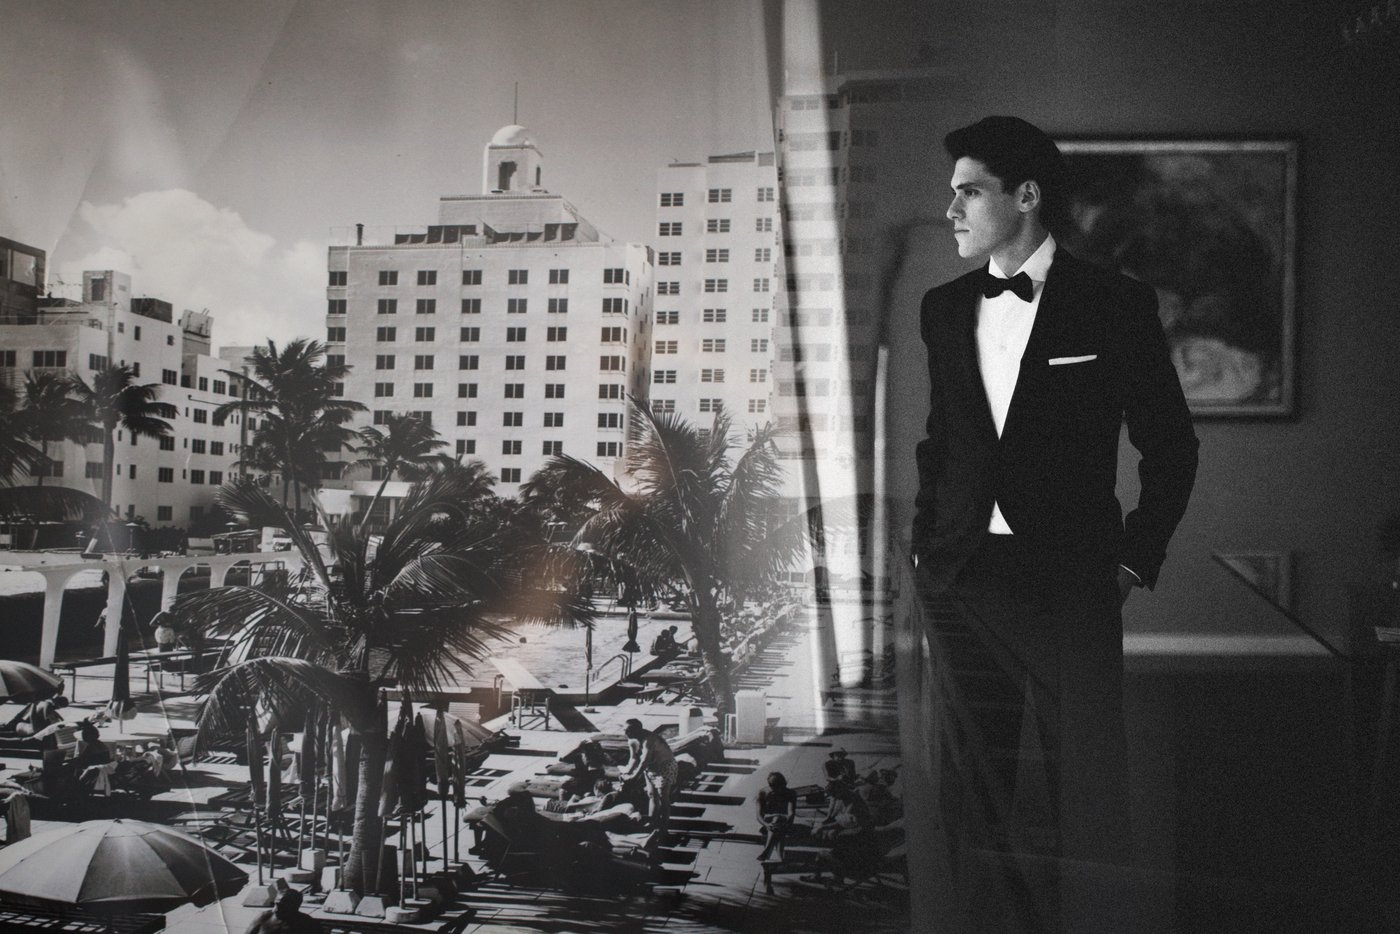 The Raleigh Hotel Wedding| Danielle + Matt | Miami Beach, FL, Miami Wedding Photographers | Häring Photography, Indian Wedding Photographer in Florida, Best Muslim, Hindu - South East Asian Wedding Photographers